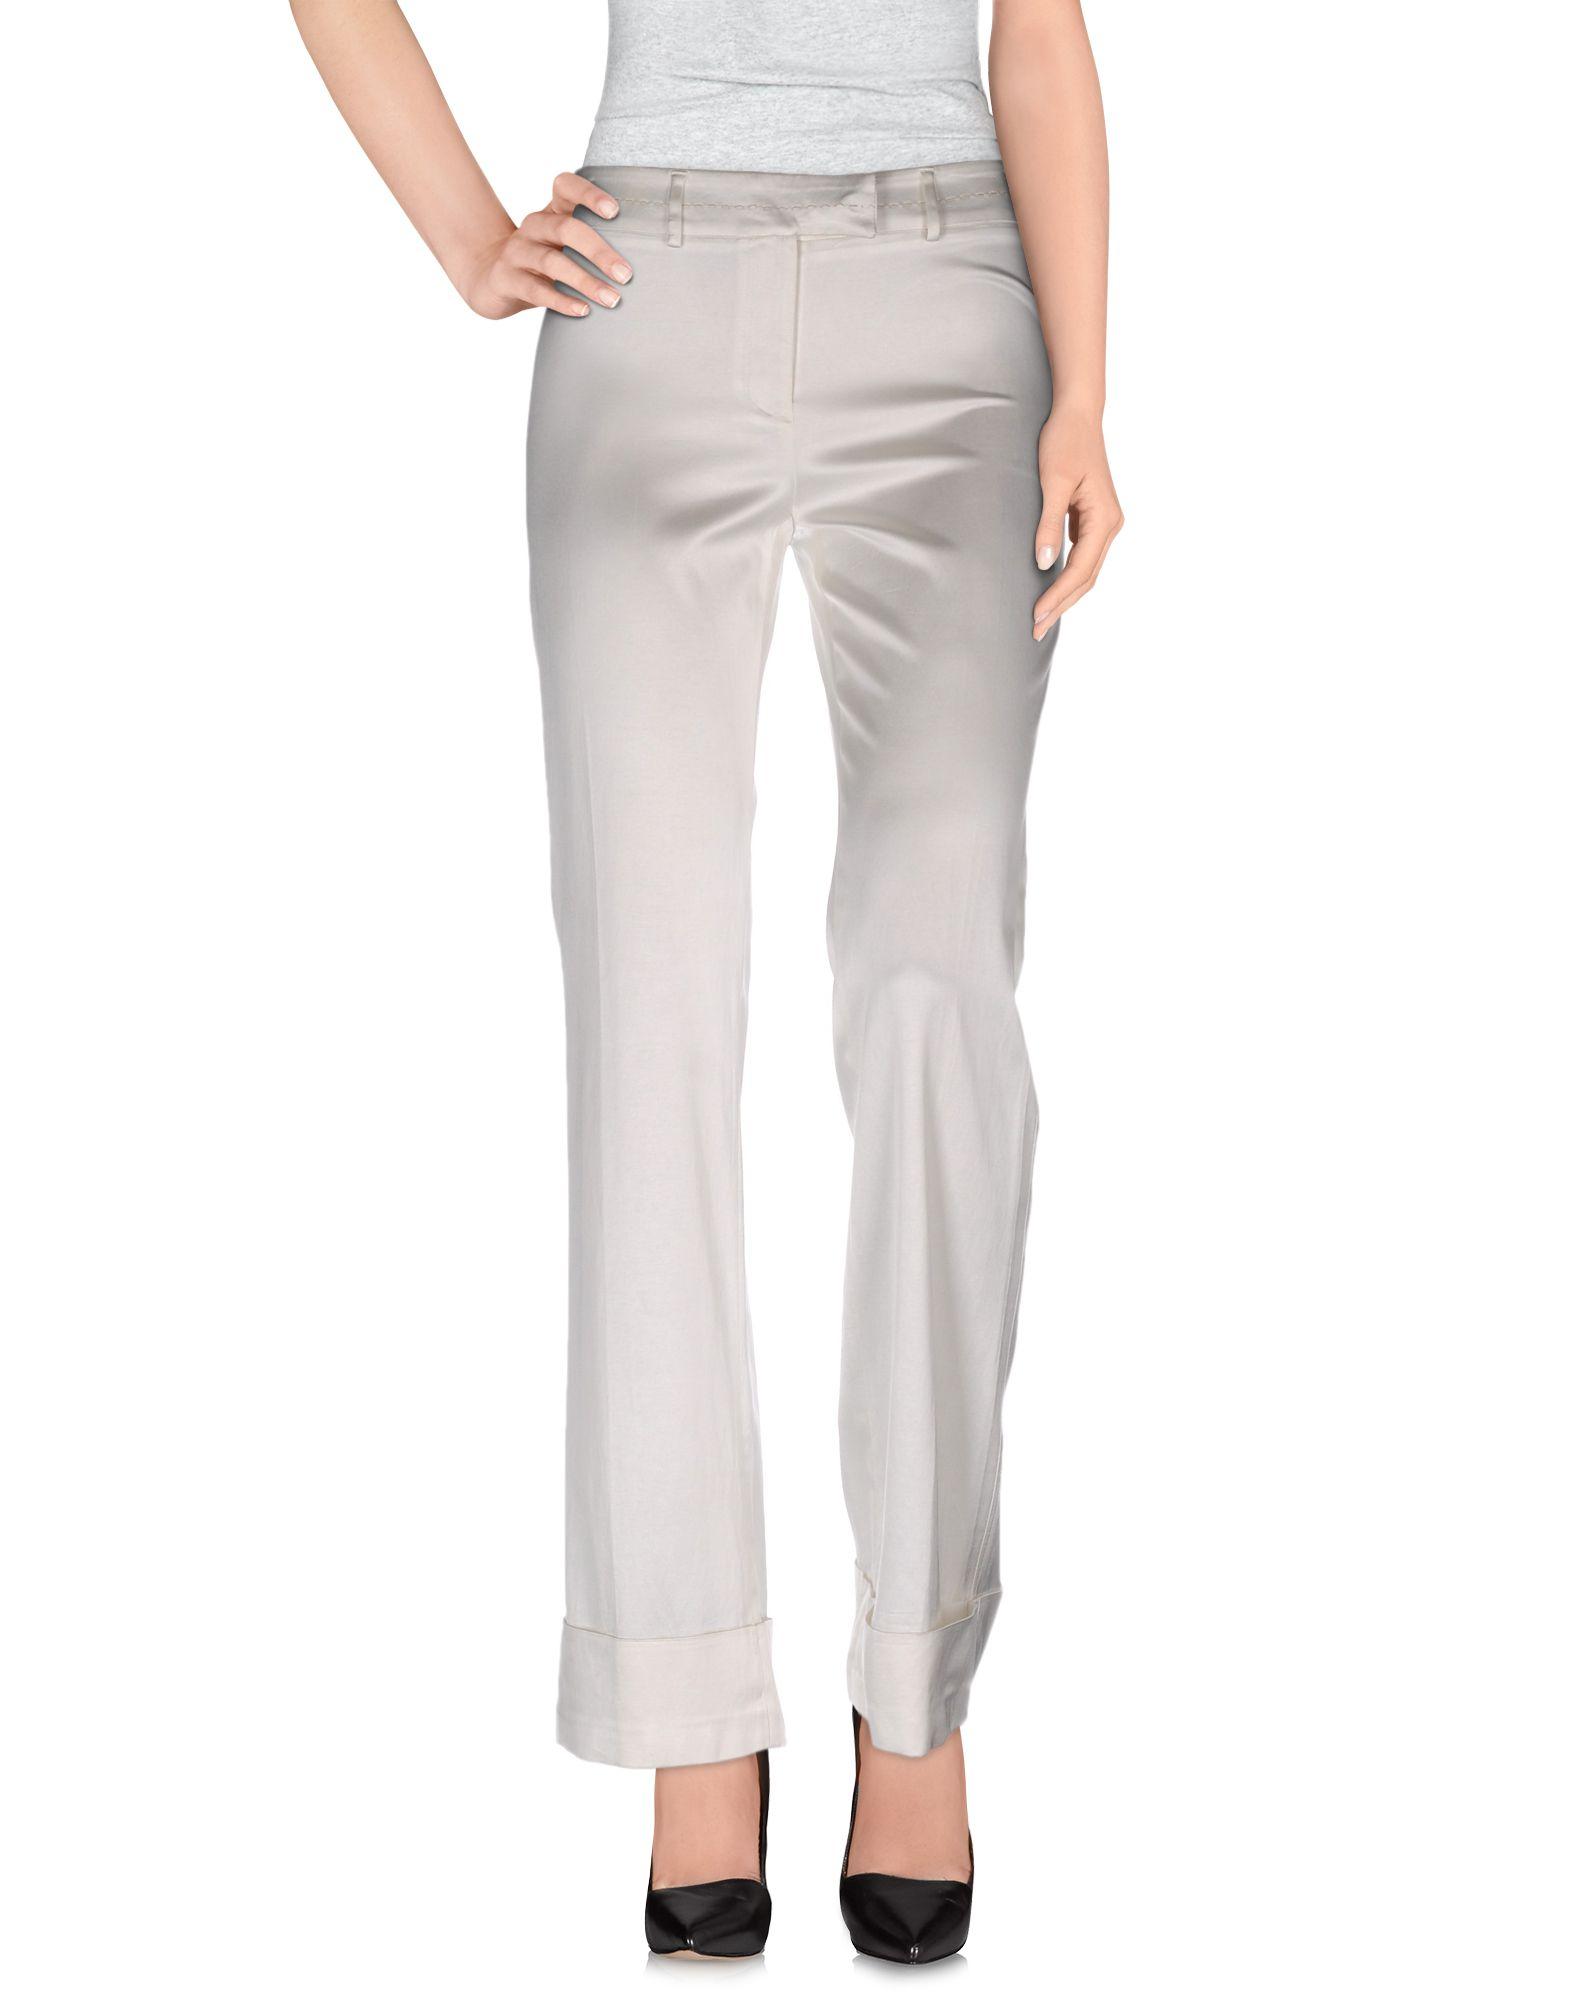 FERRE' JEANS Повседневные брюки брюки gf ferre брюки широкие